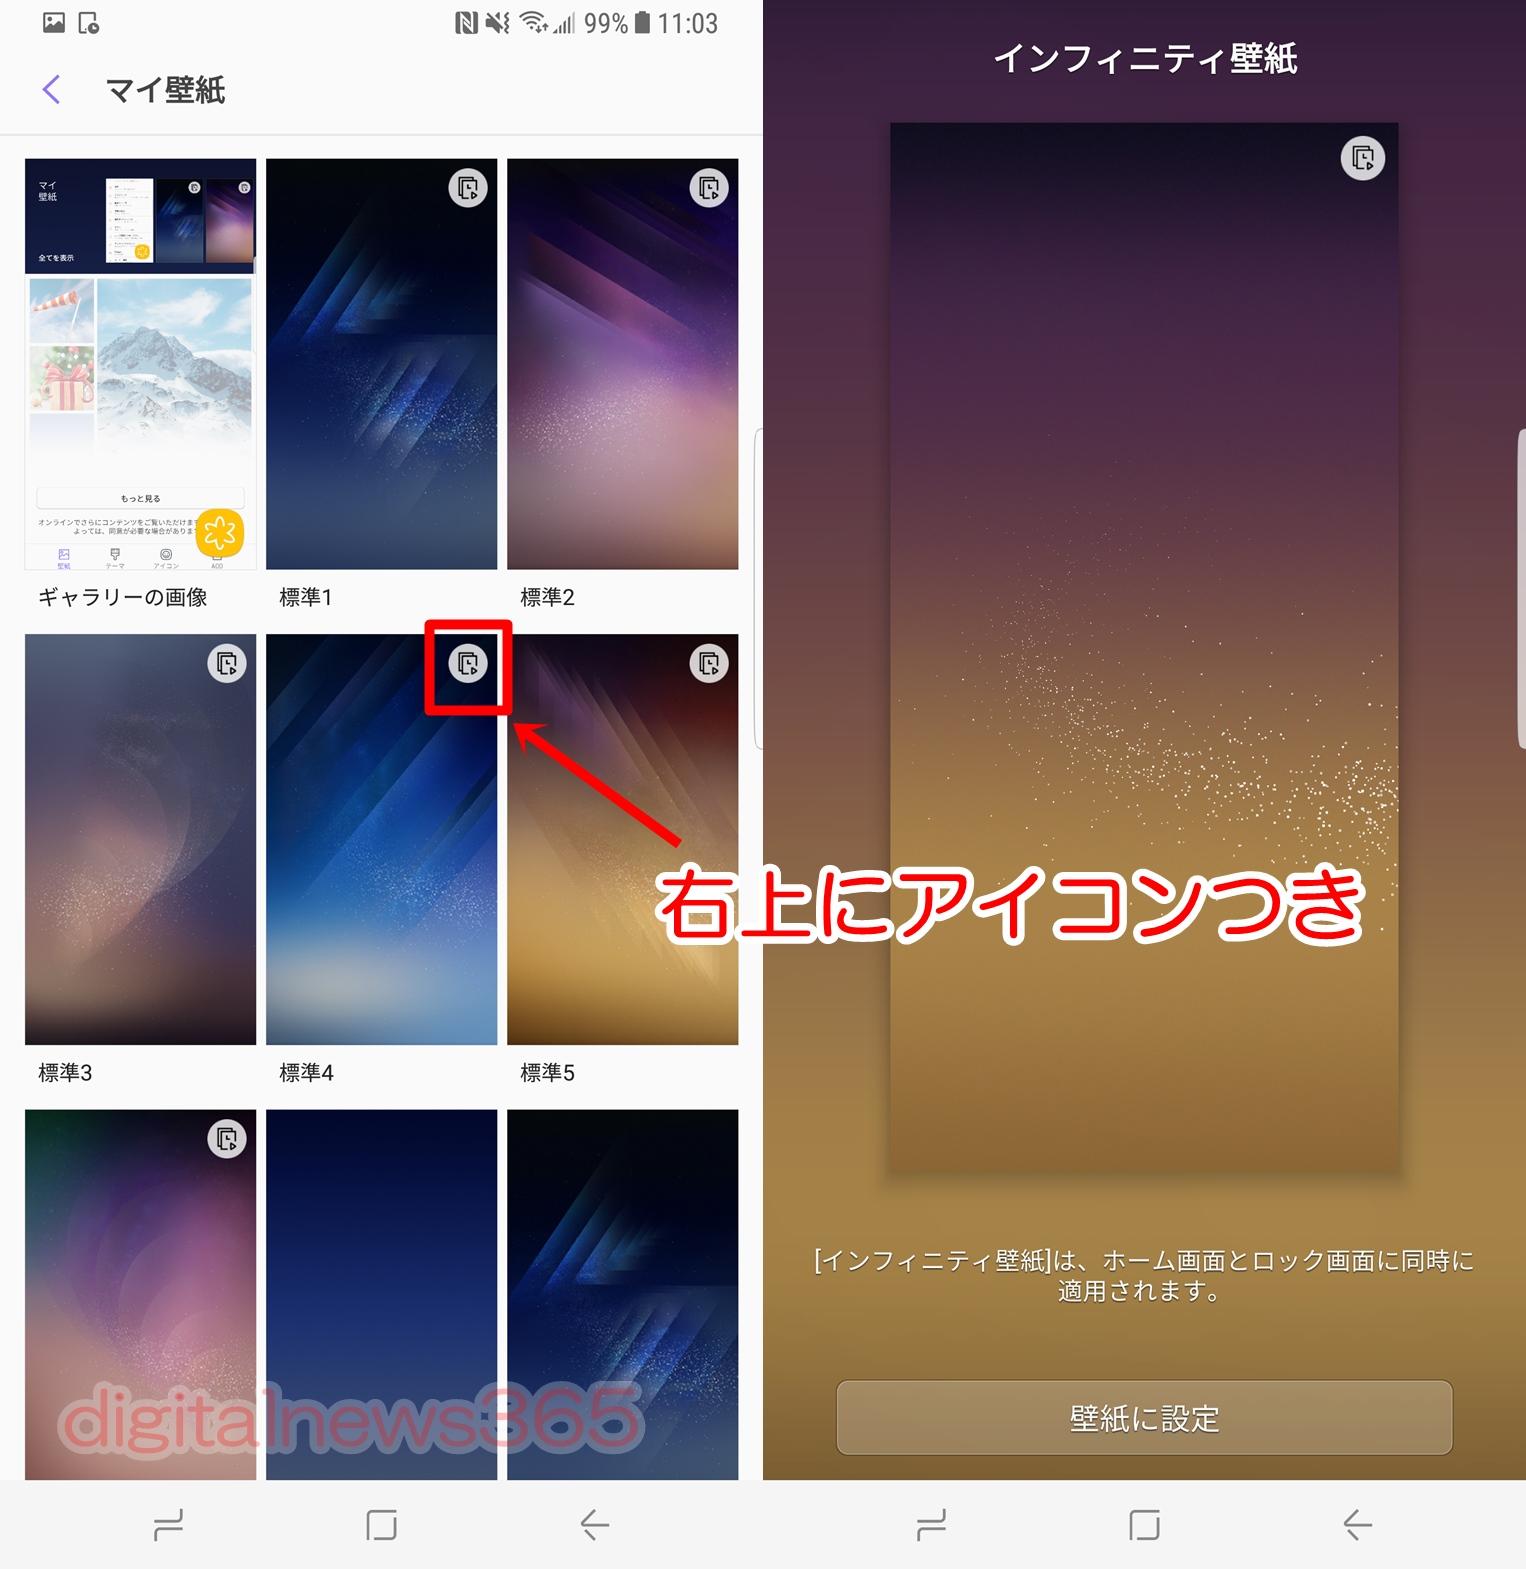 Galaxy S8の壁紙サイズと壁紙の変更方法 画面解像度を変更してサイズ